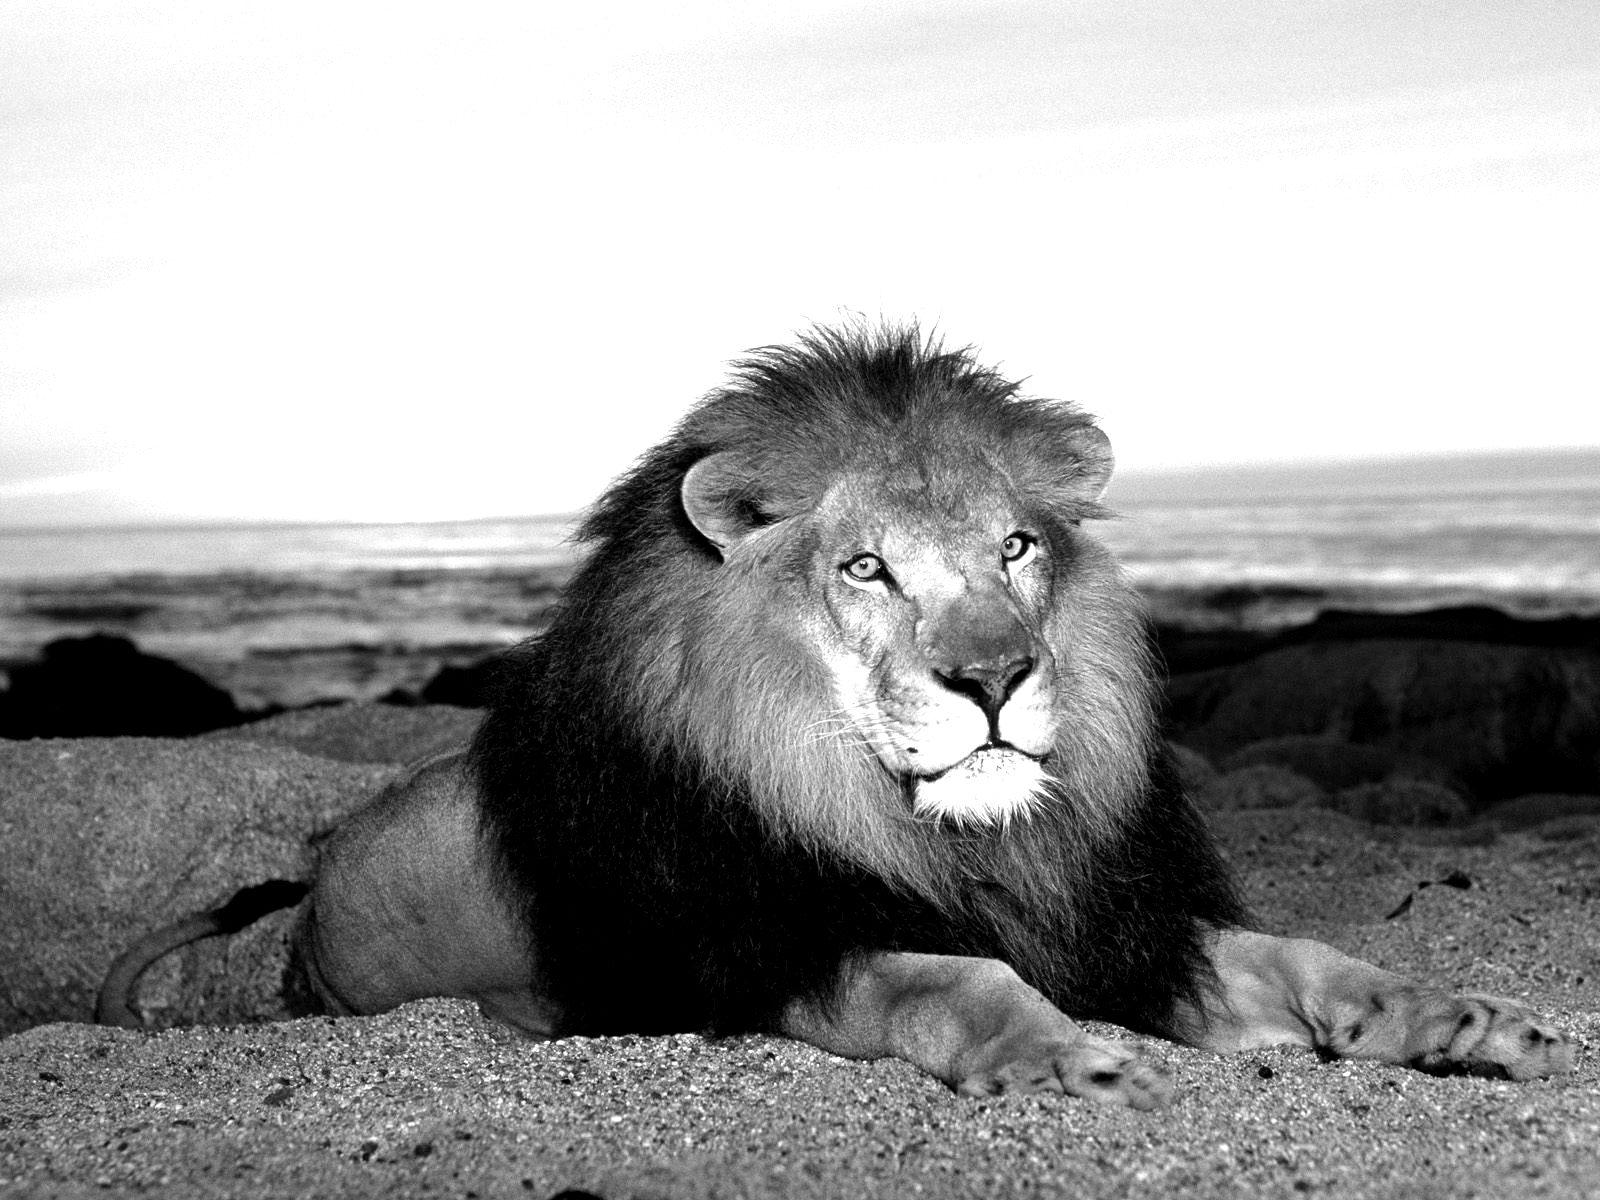 Lion Wallpaper Black and White - WallpaperSafari